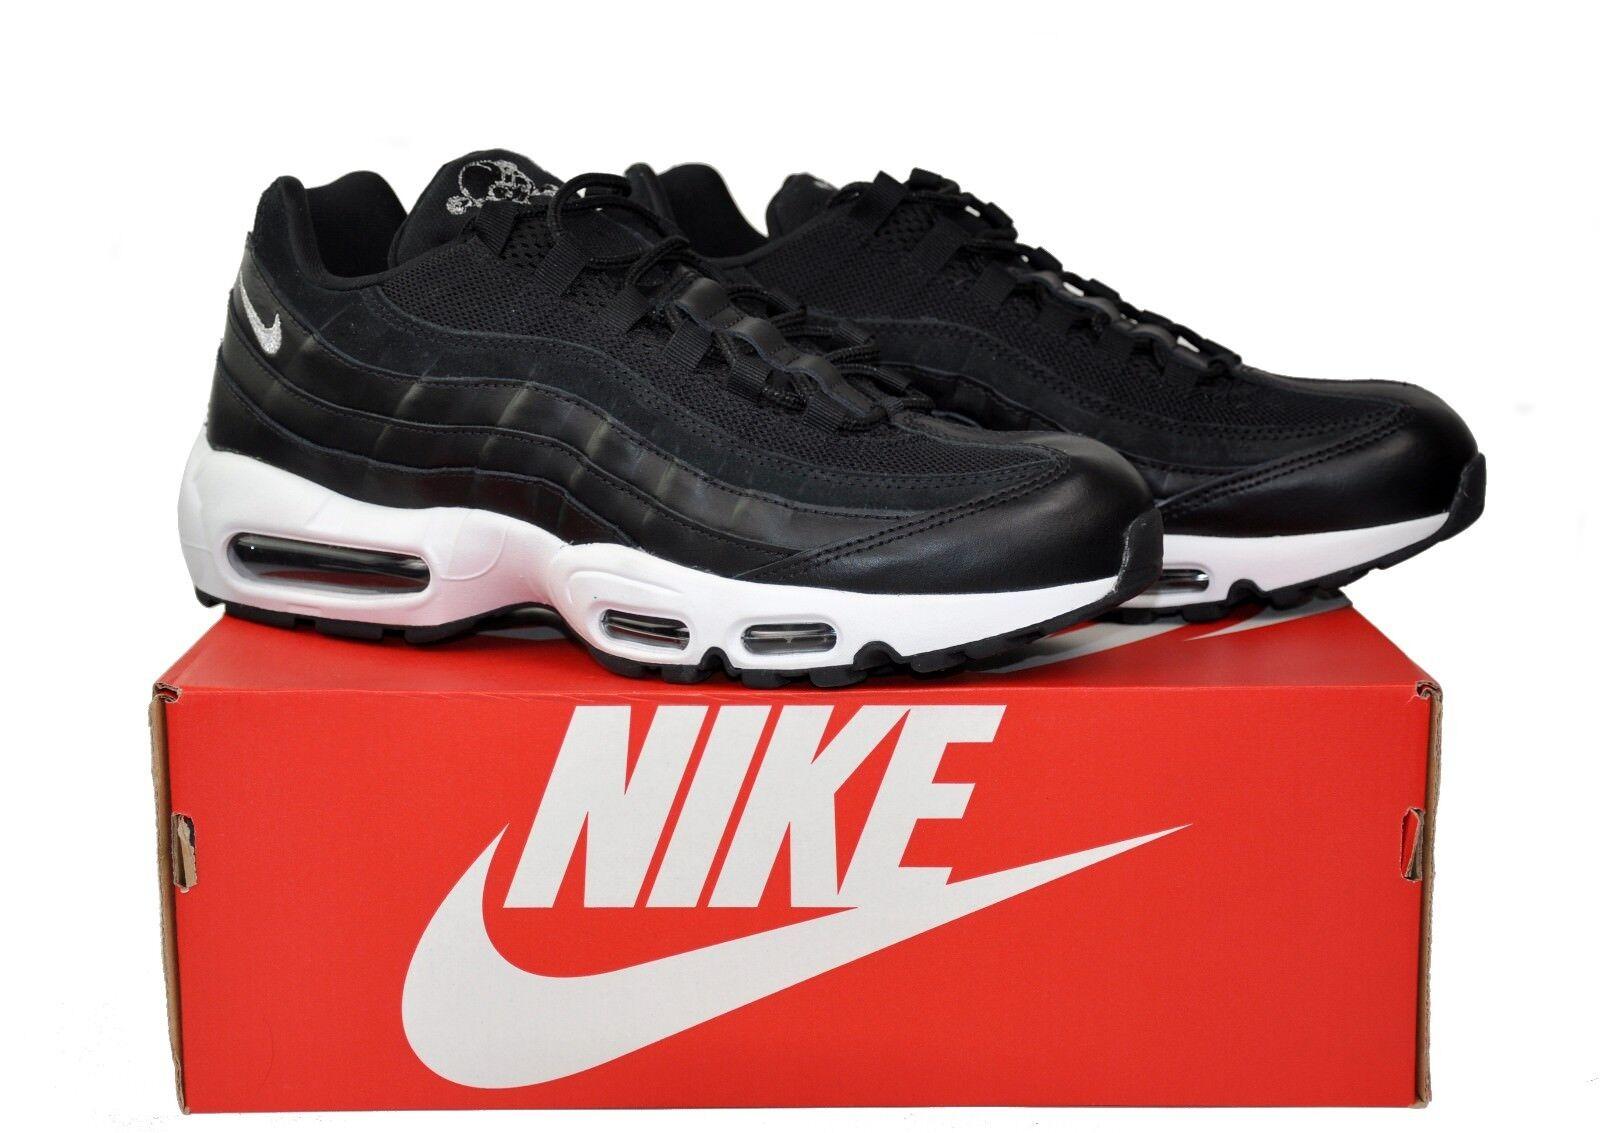 Nike AIR MAX 95 Premium Rebel Skulls Black 11.5 Chrome 538416-008 Leather Sz 11.5 Black 11 9369ae